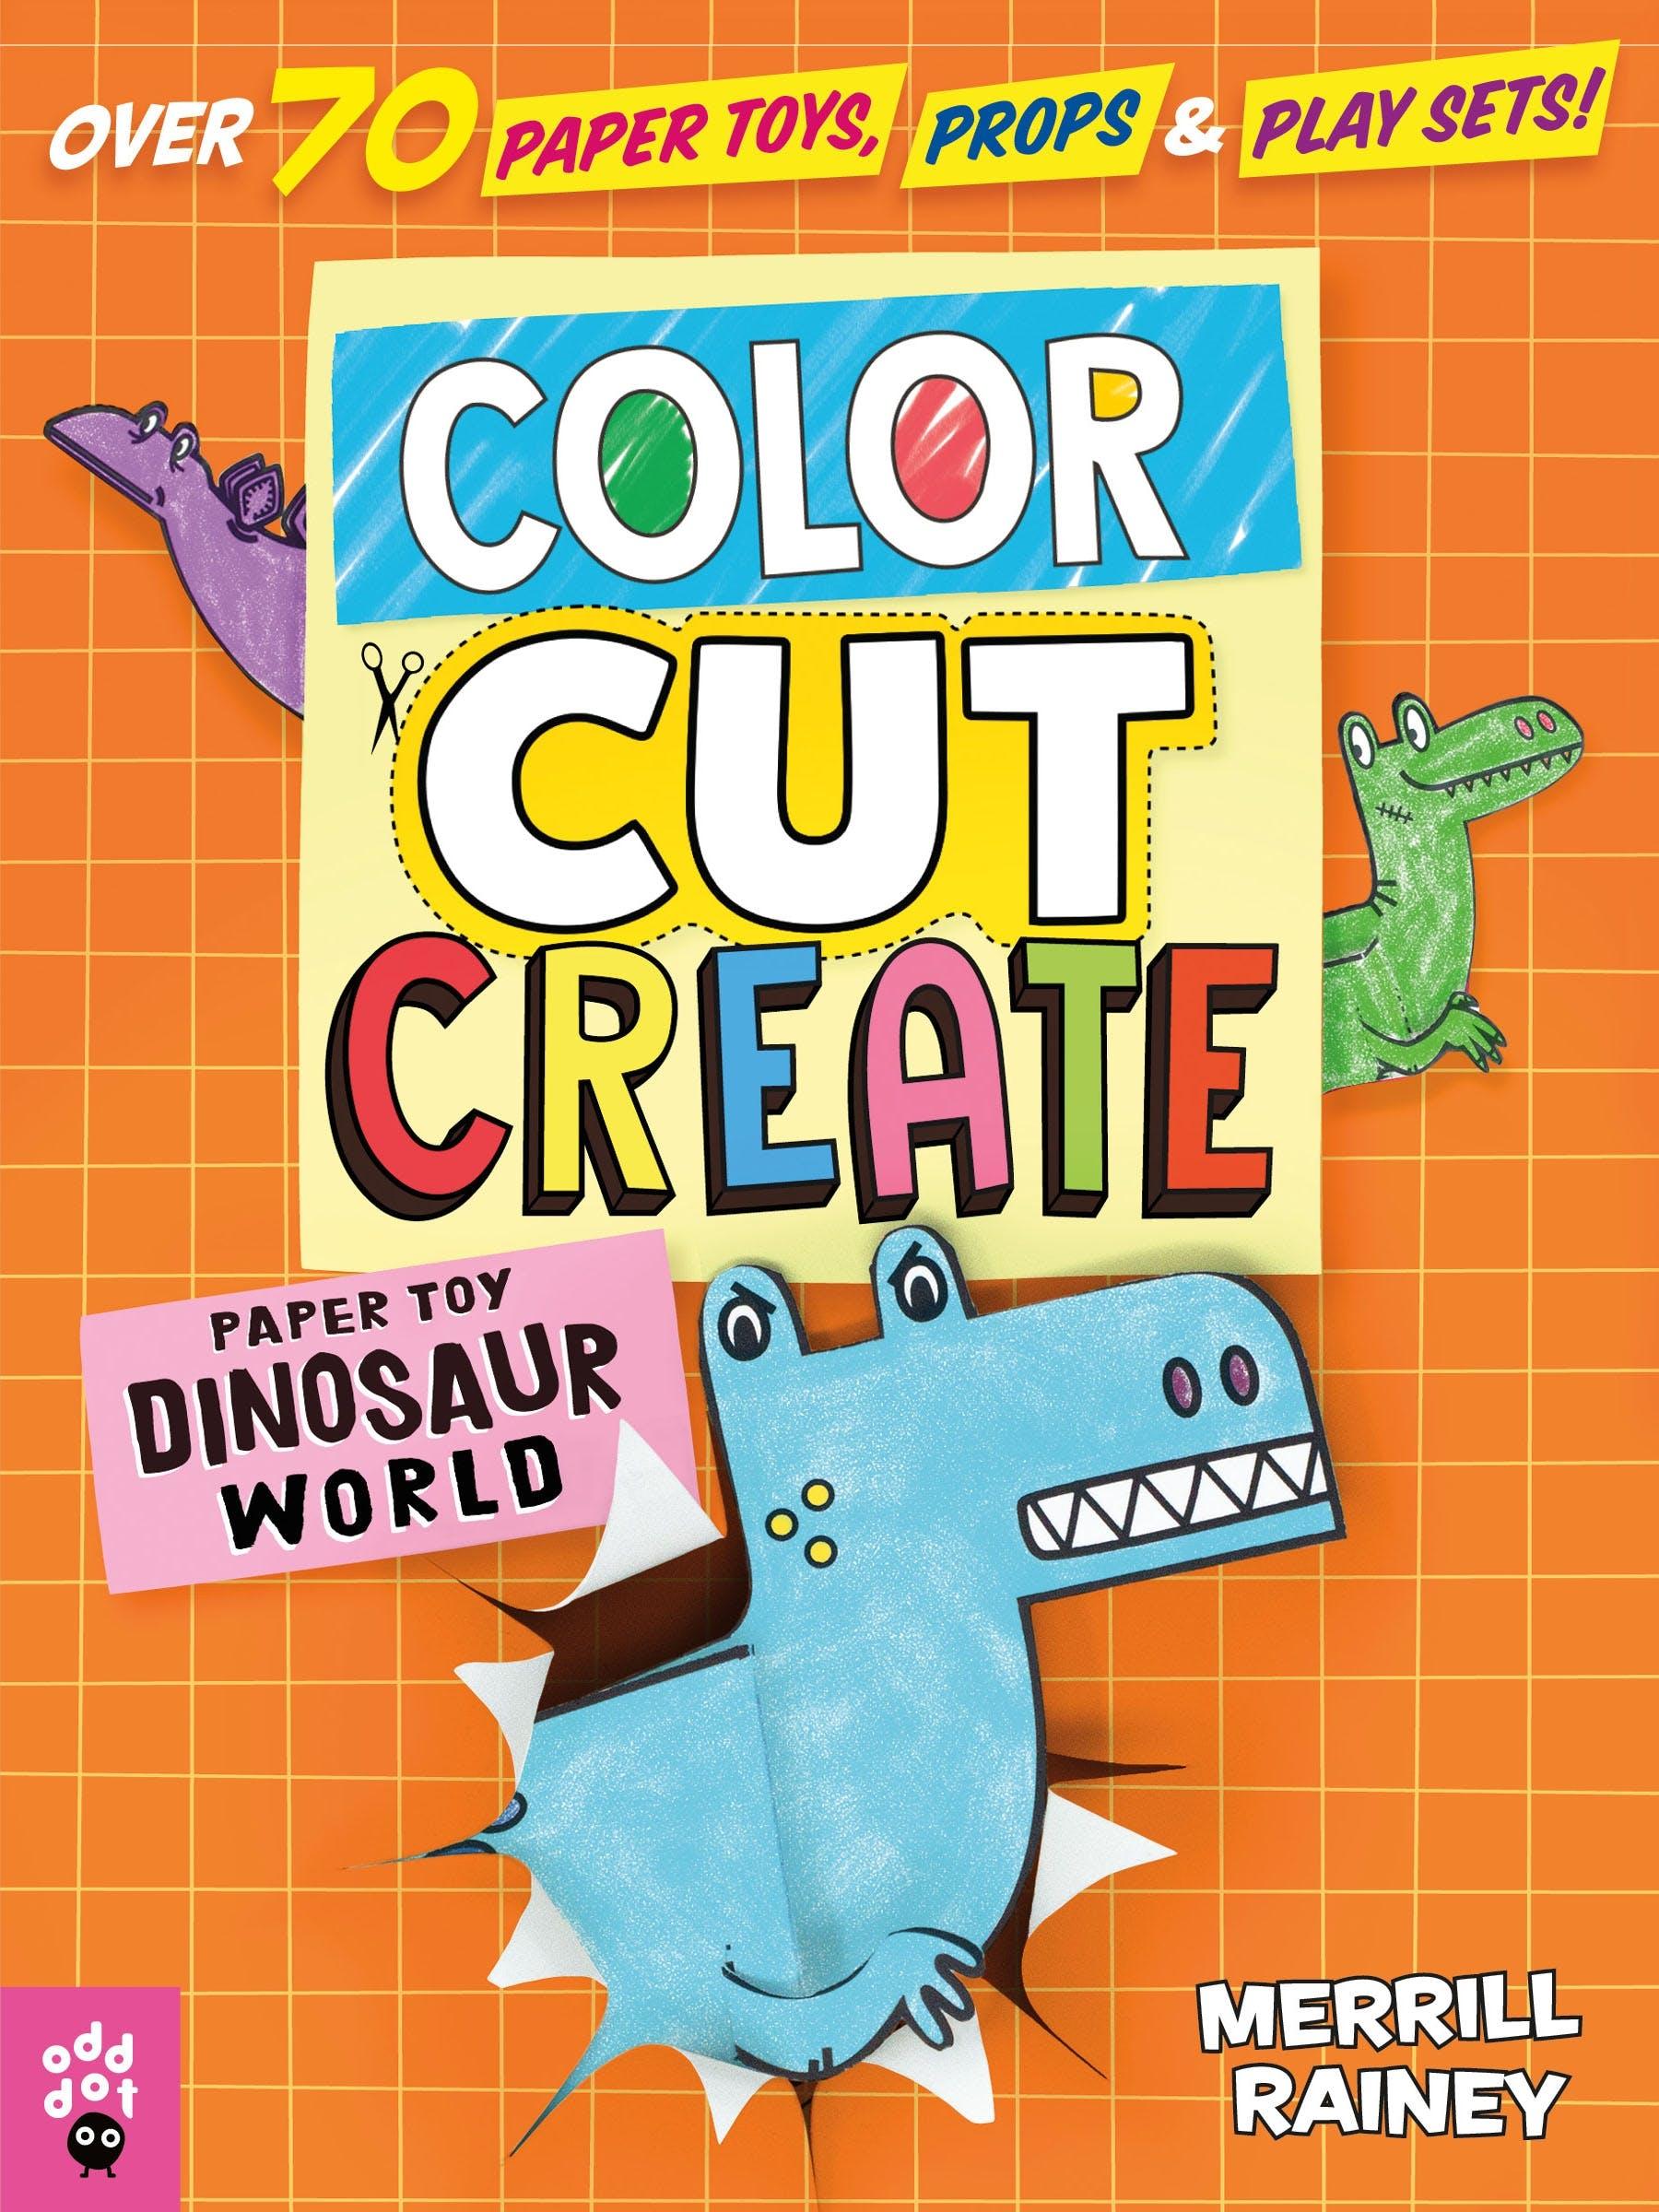 Image of Color, Cut, Create Play Sets: Dinosaur World